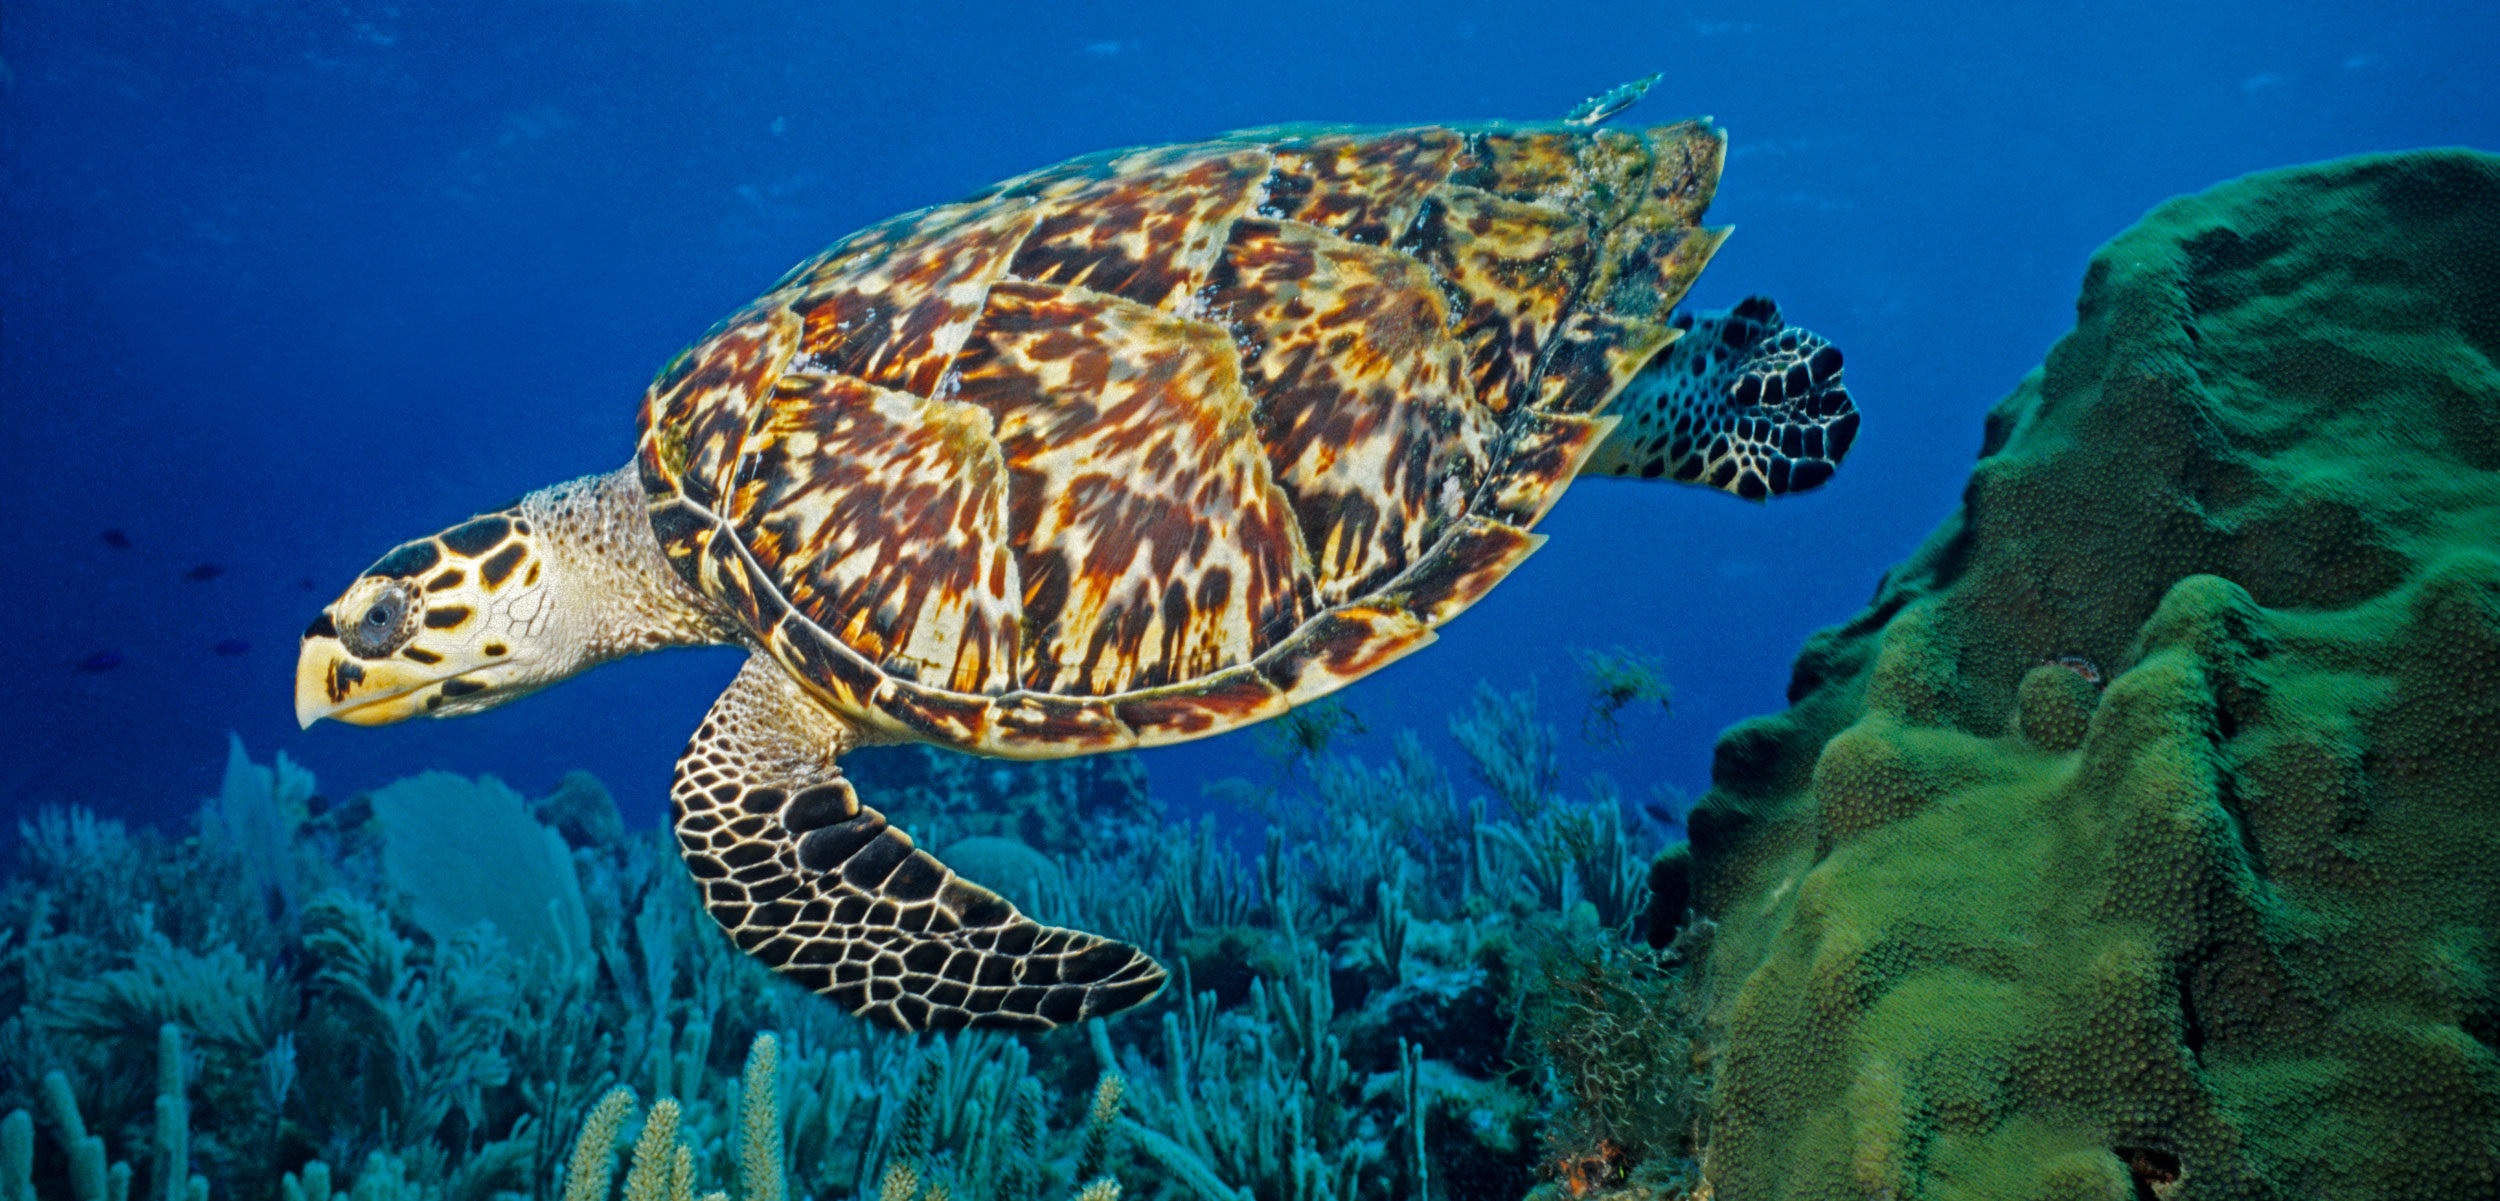 hawksbill turtle underwater